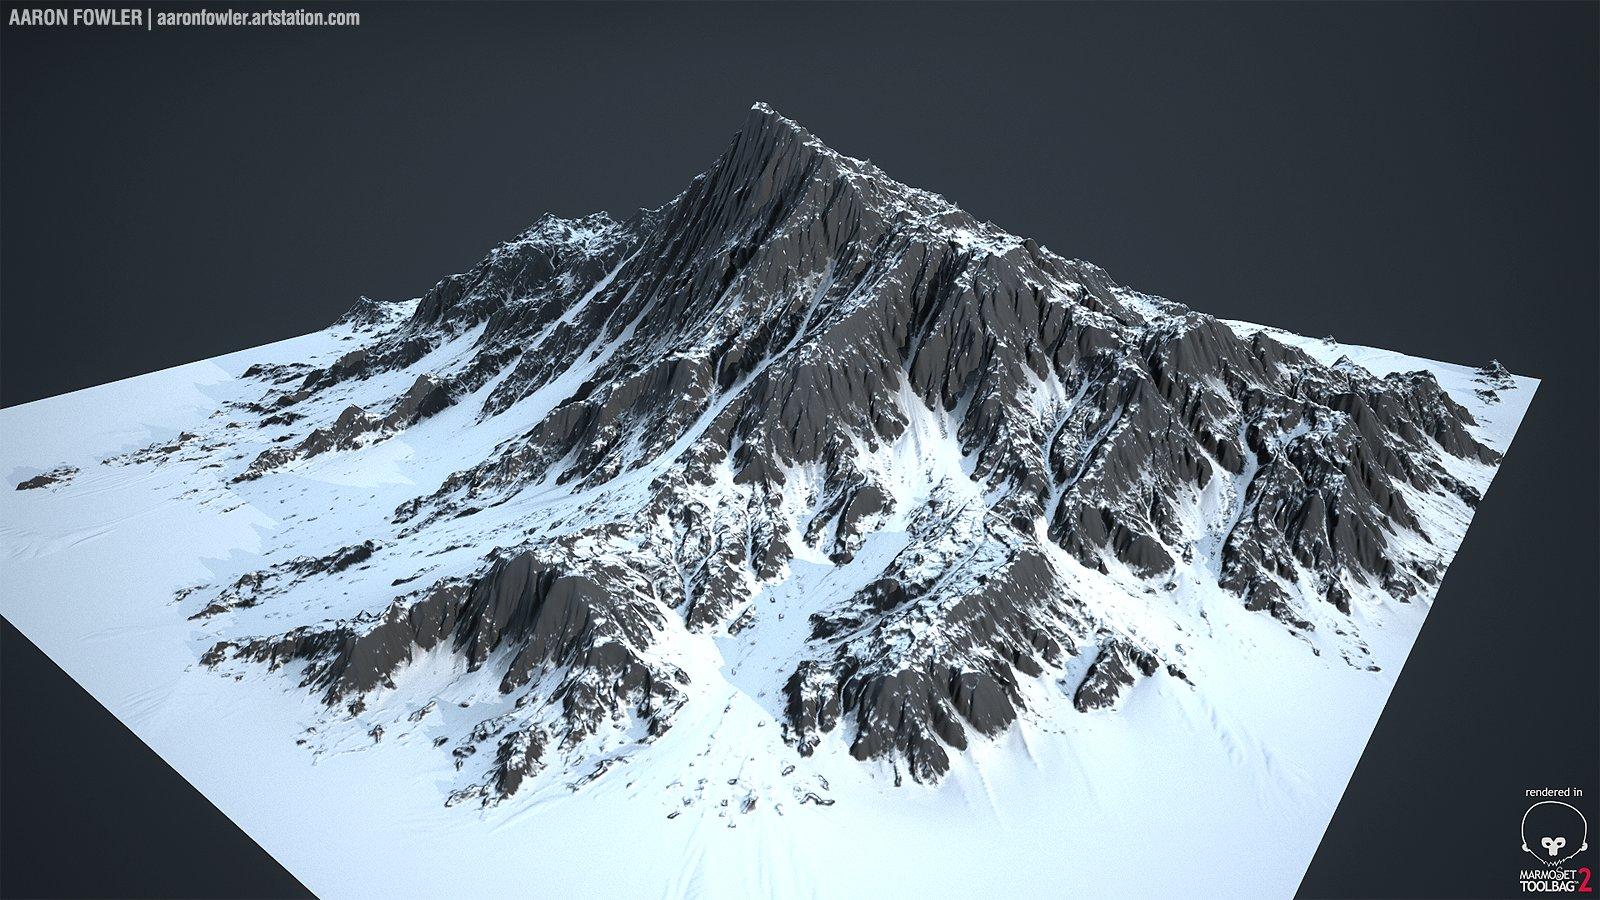 aaron-fowler-aaron-fowler-terrain01.jpg?1436540135